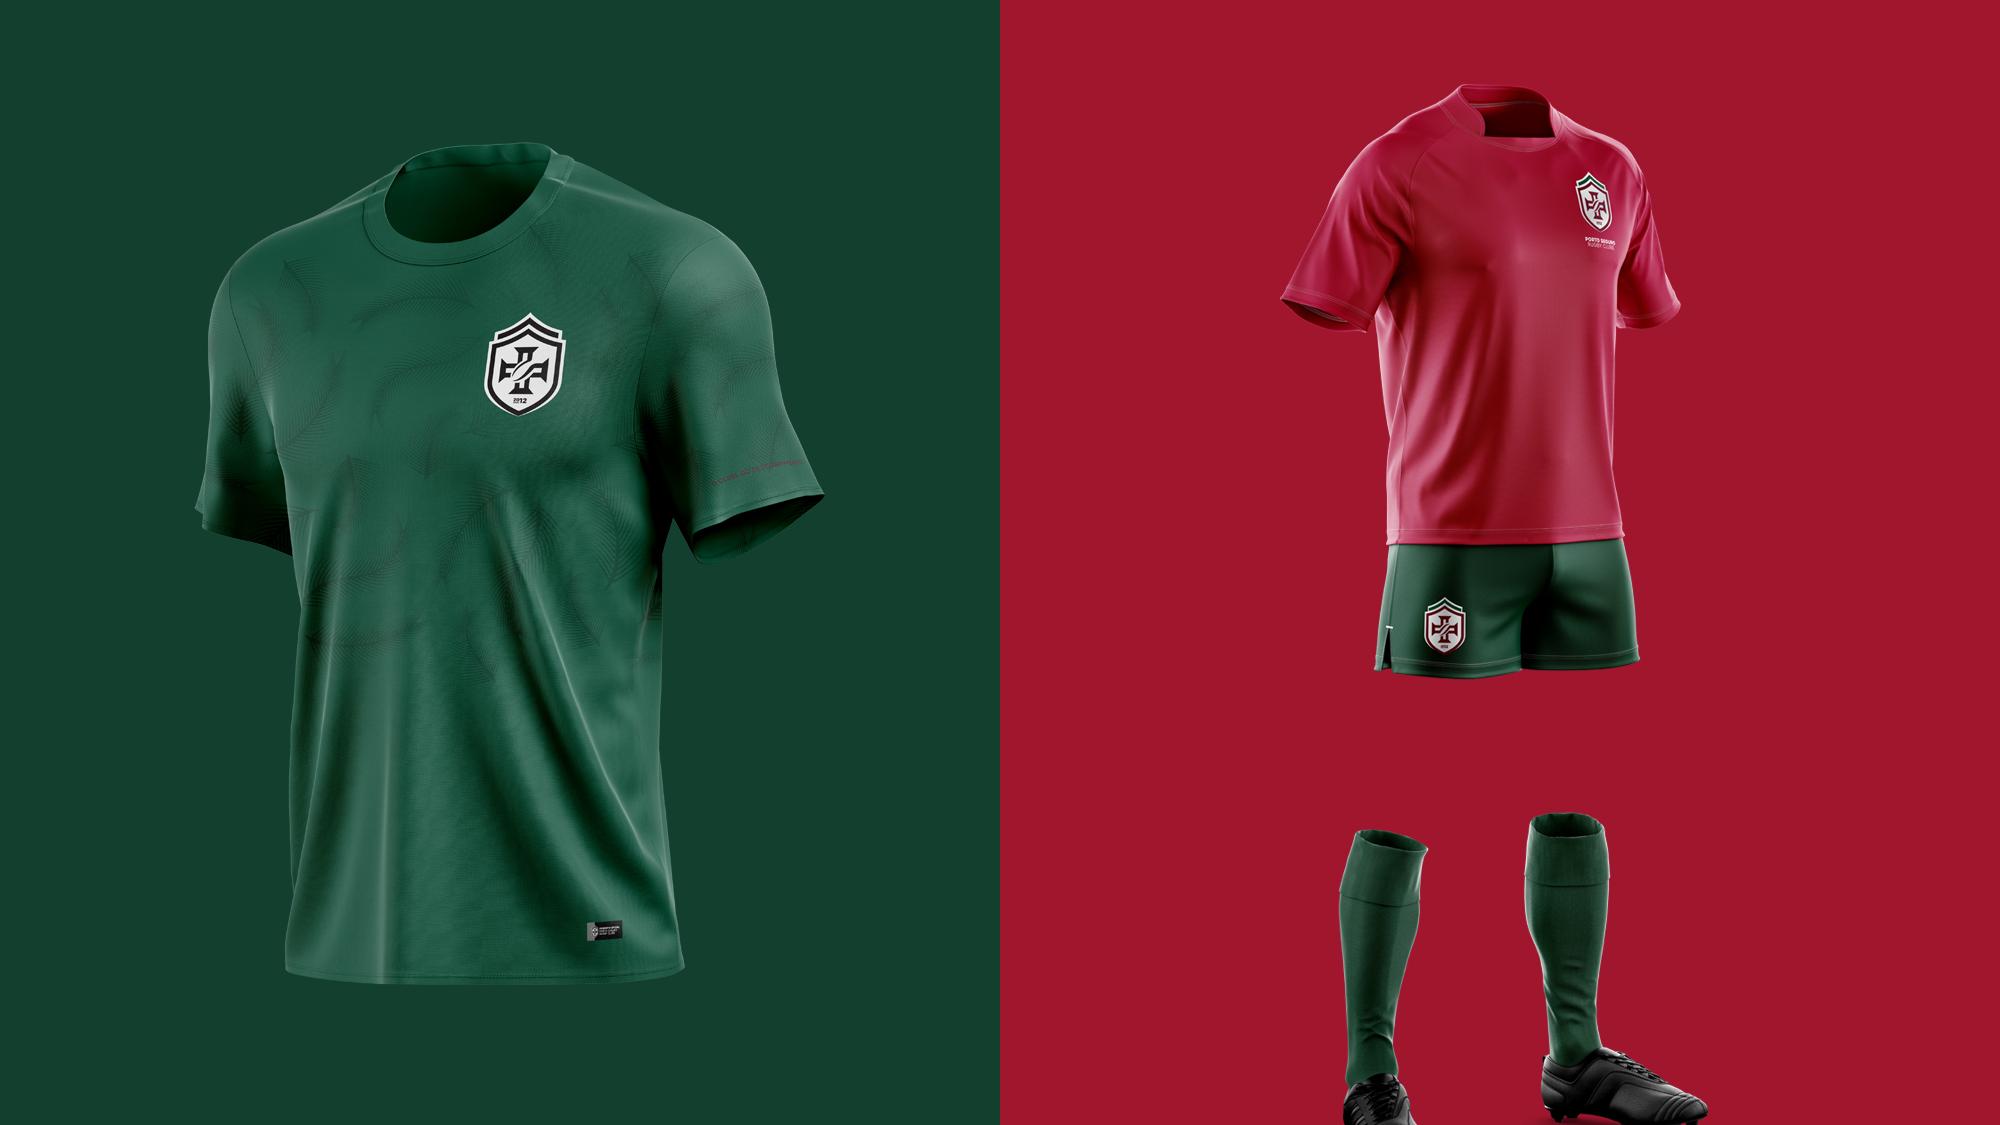 Porto-Seguro-Rugby-Clube-Brand-Identity-Presentation-6